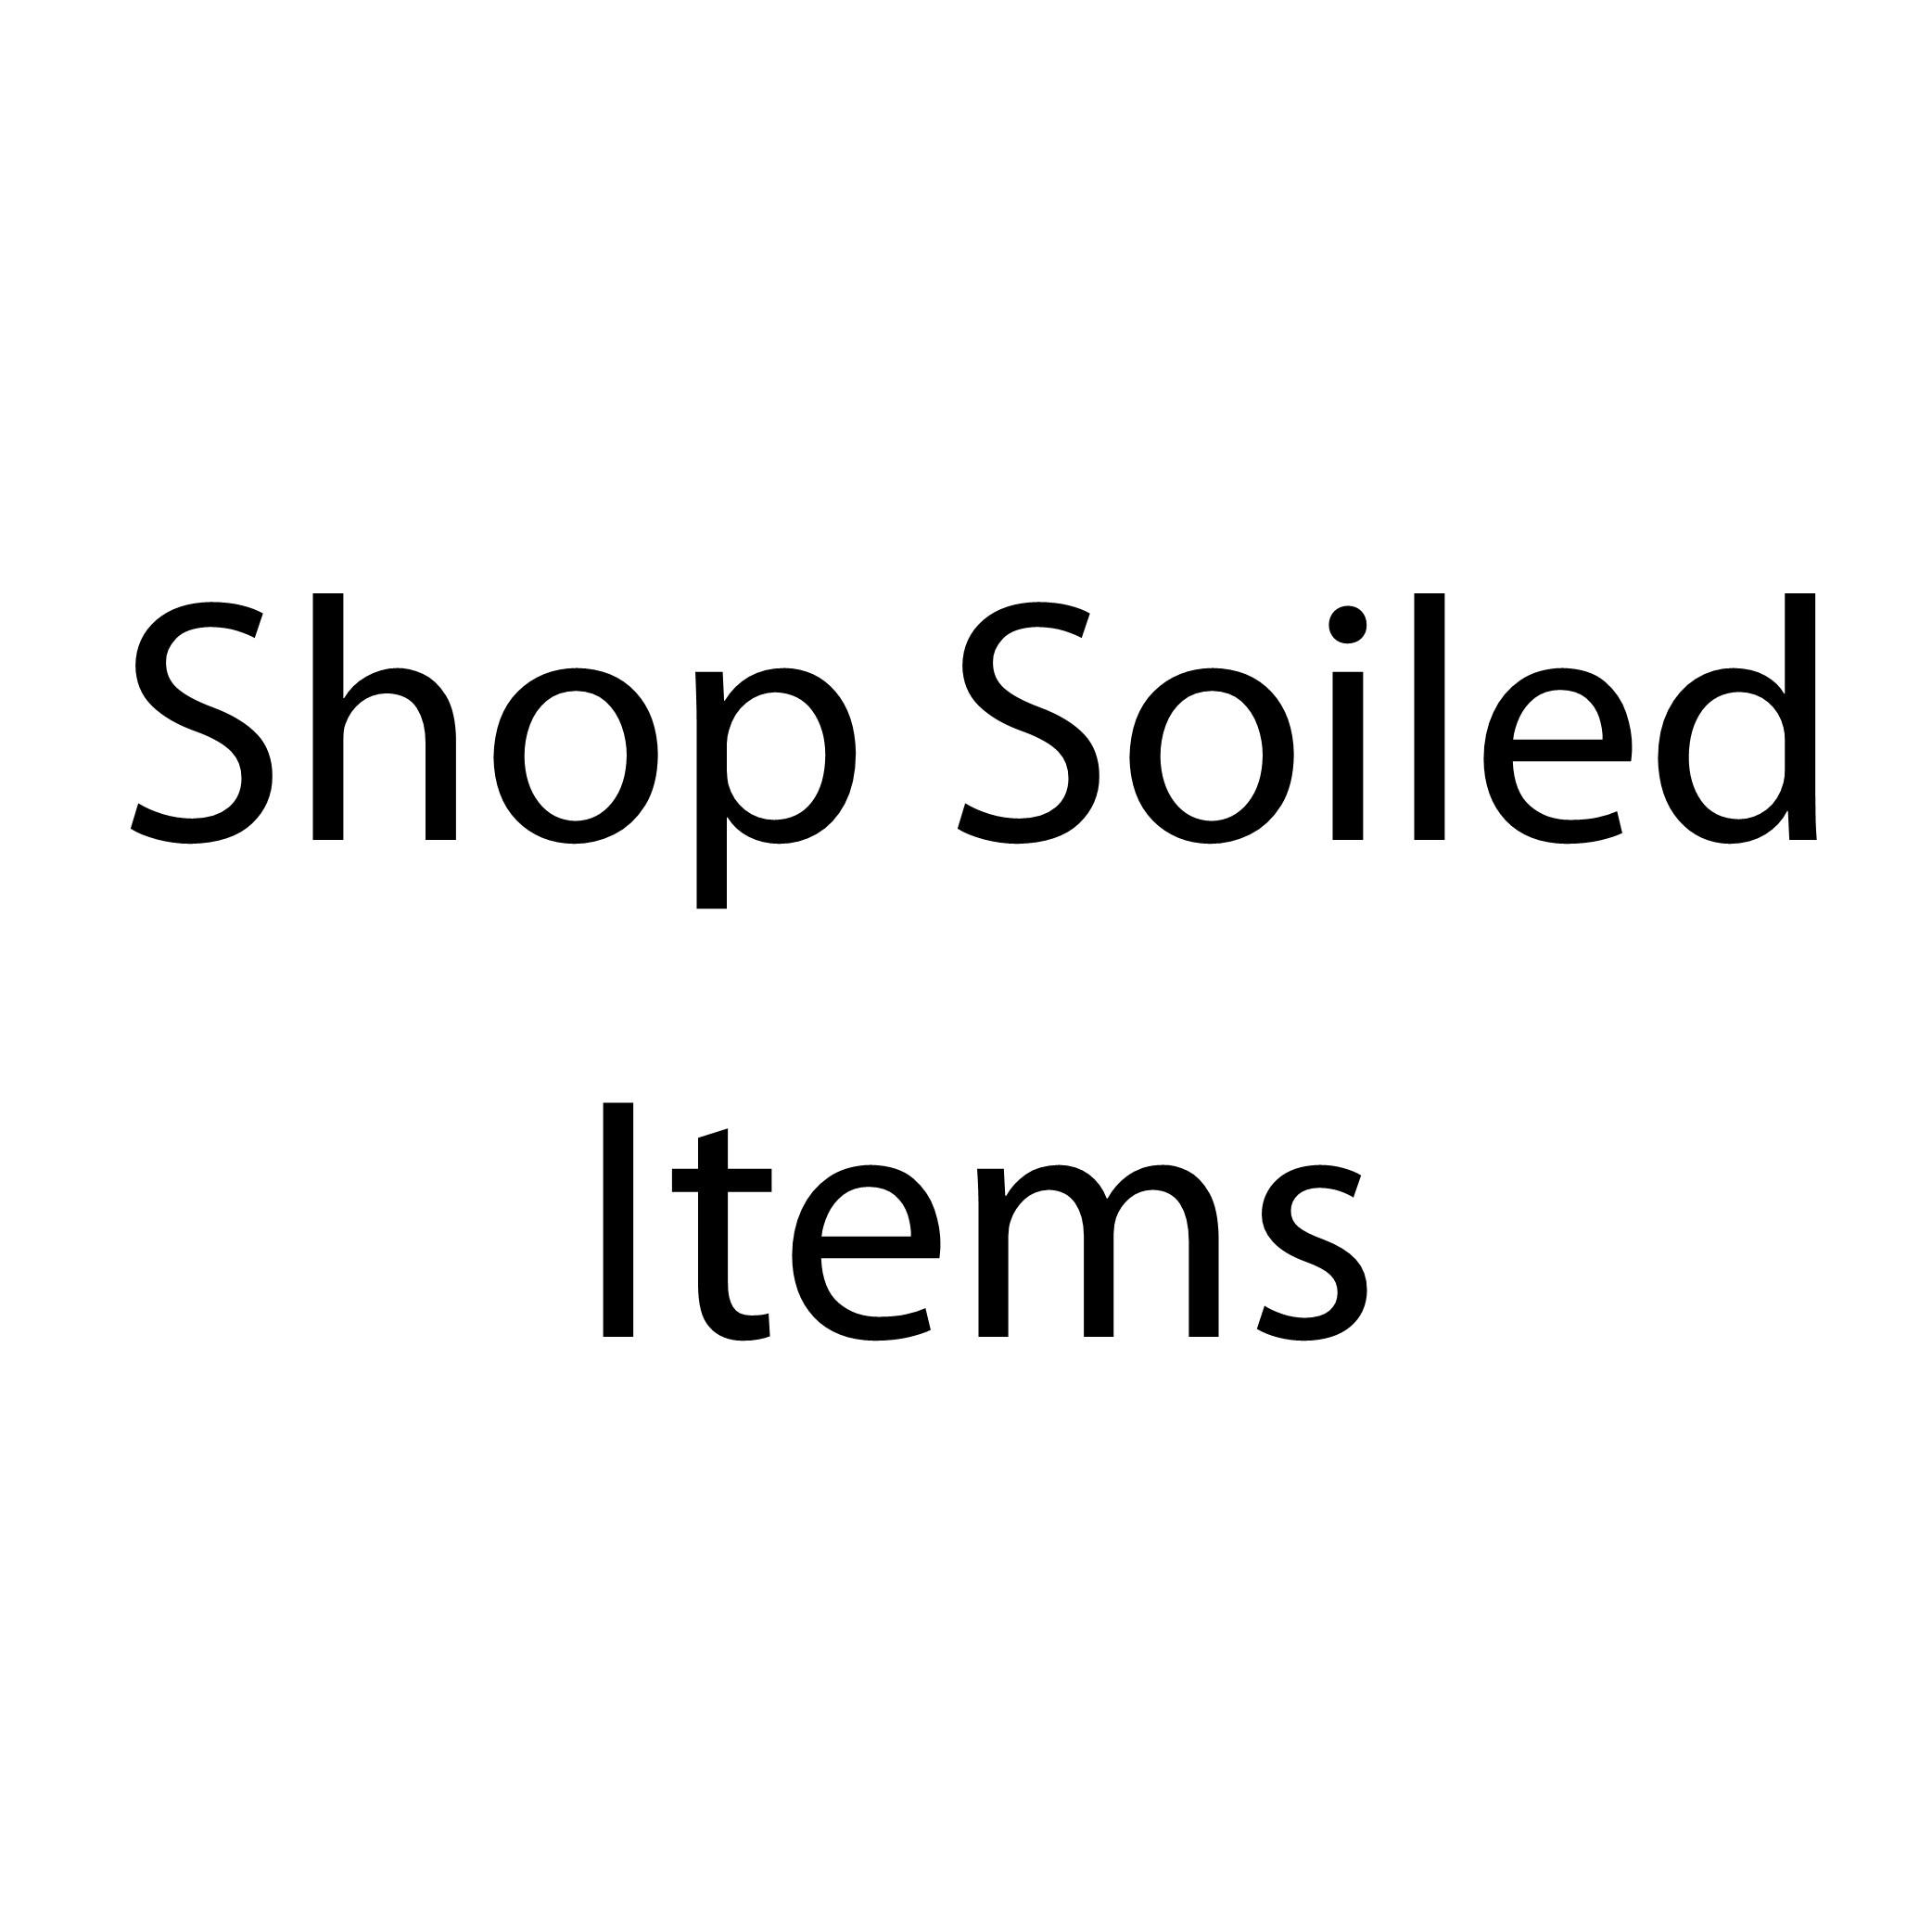 Clearance Shop Soiled